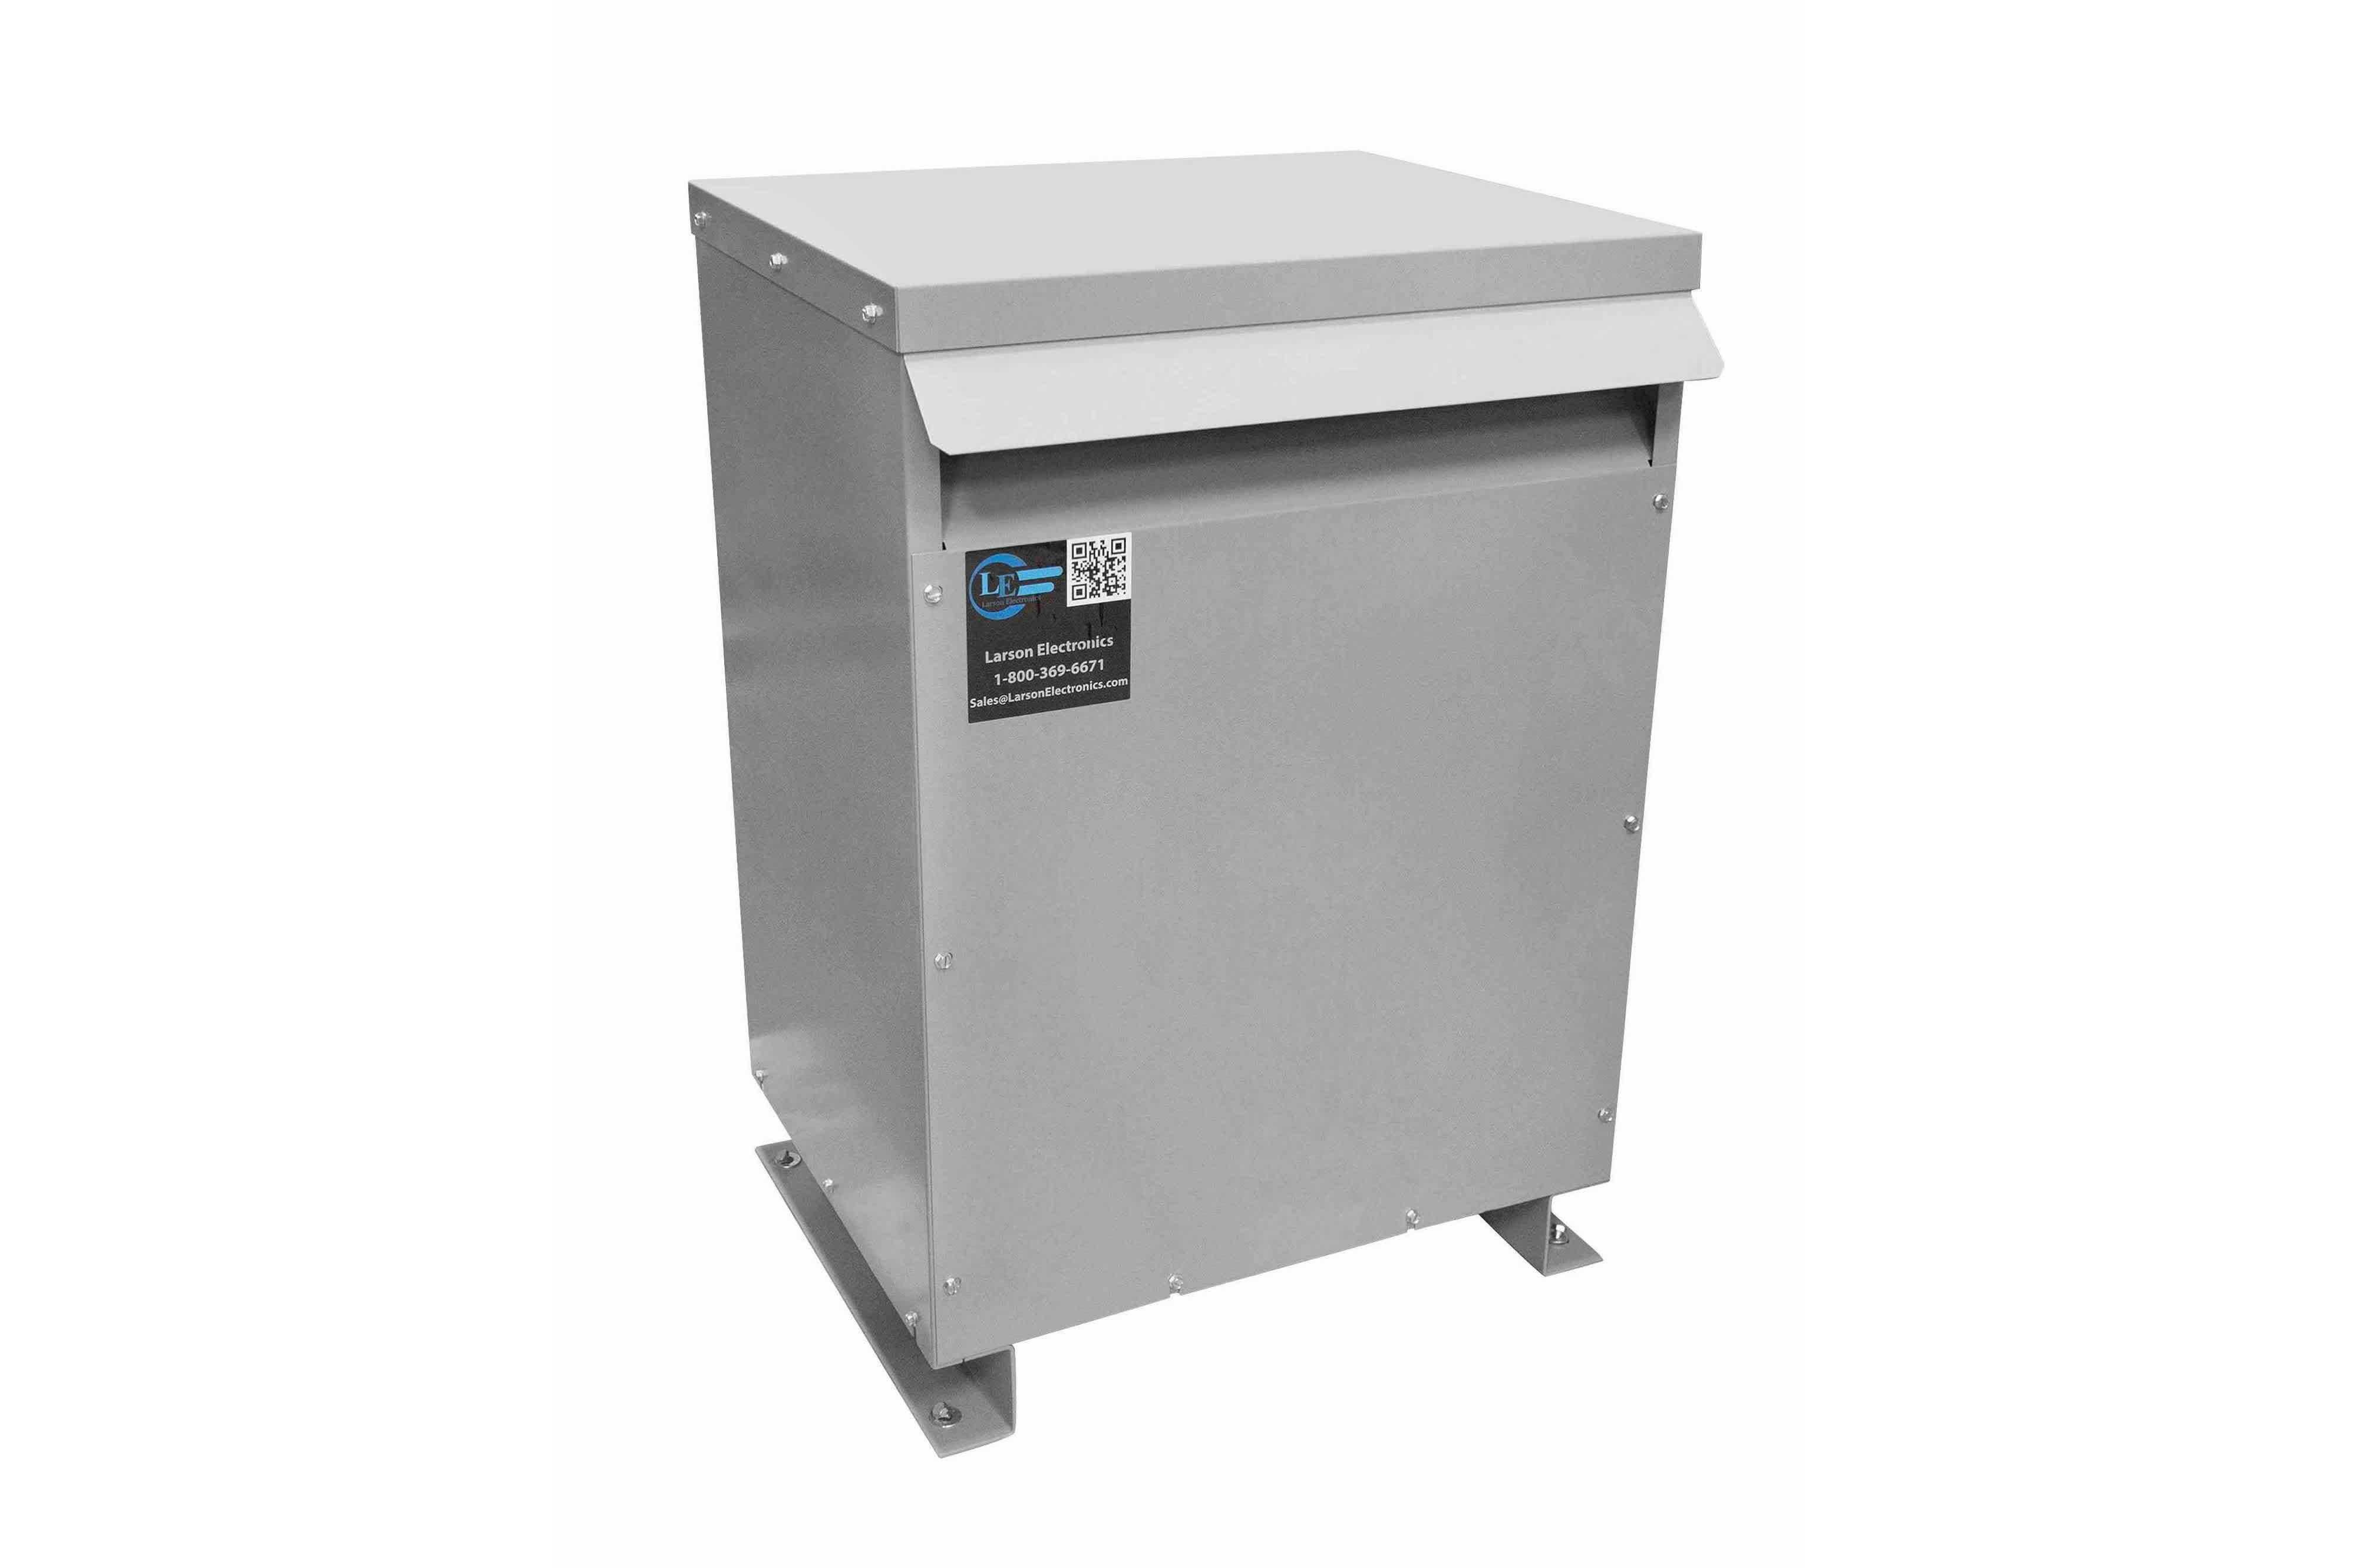 47.5 kVA 3PH Isolation Transformer, 208V Wye Primary, 600Y/347 Wye-N Secondary, N3R, Ventilated, 60 Hz